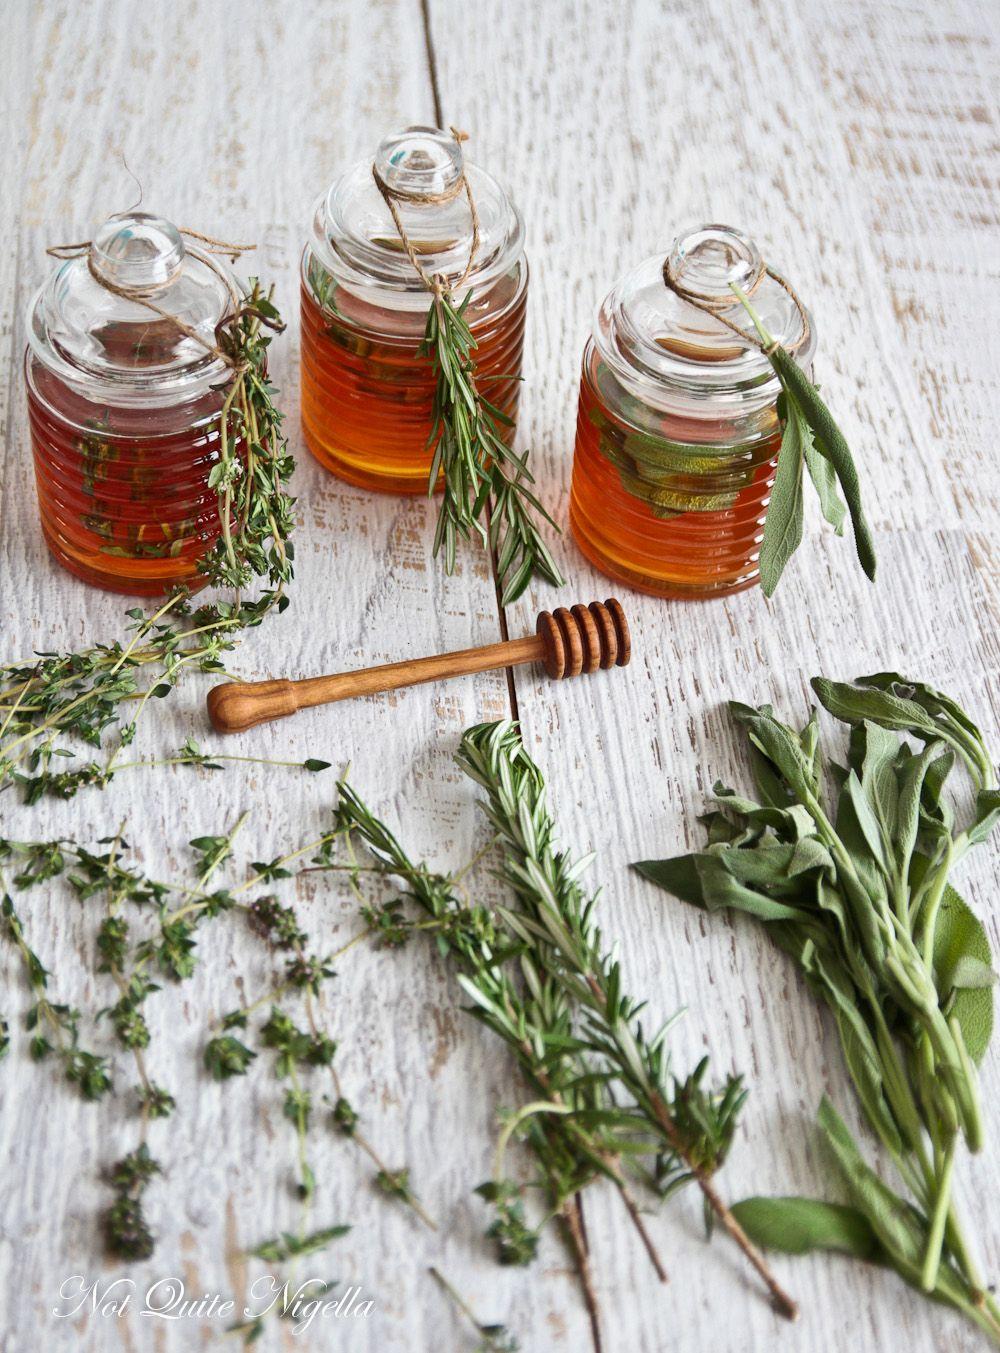 Rosemary, Lemon Thyme and Sage Honeys